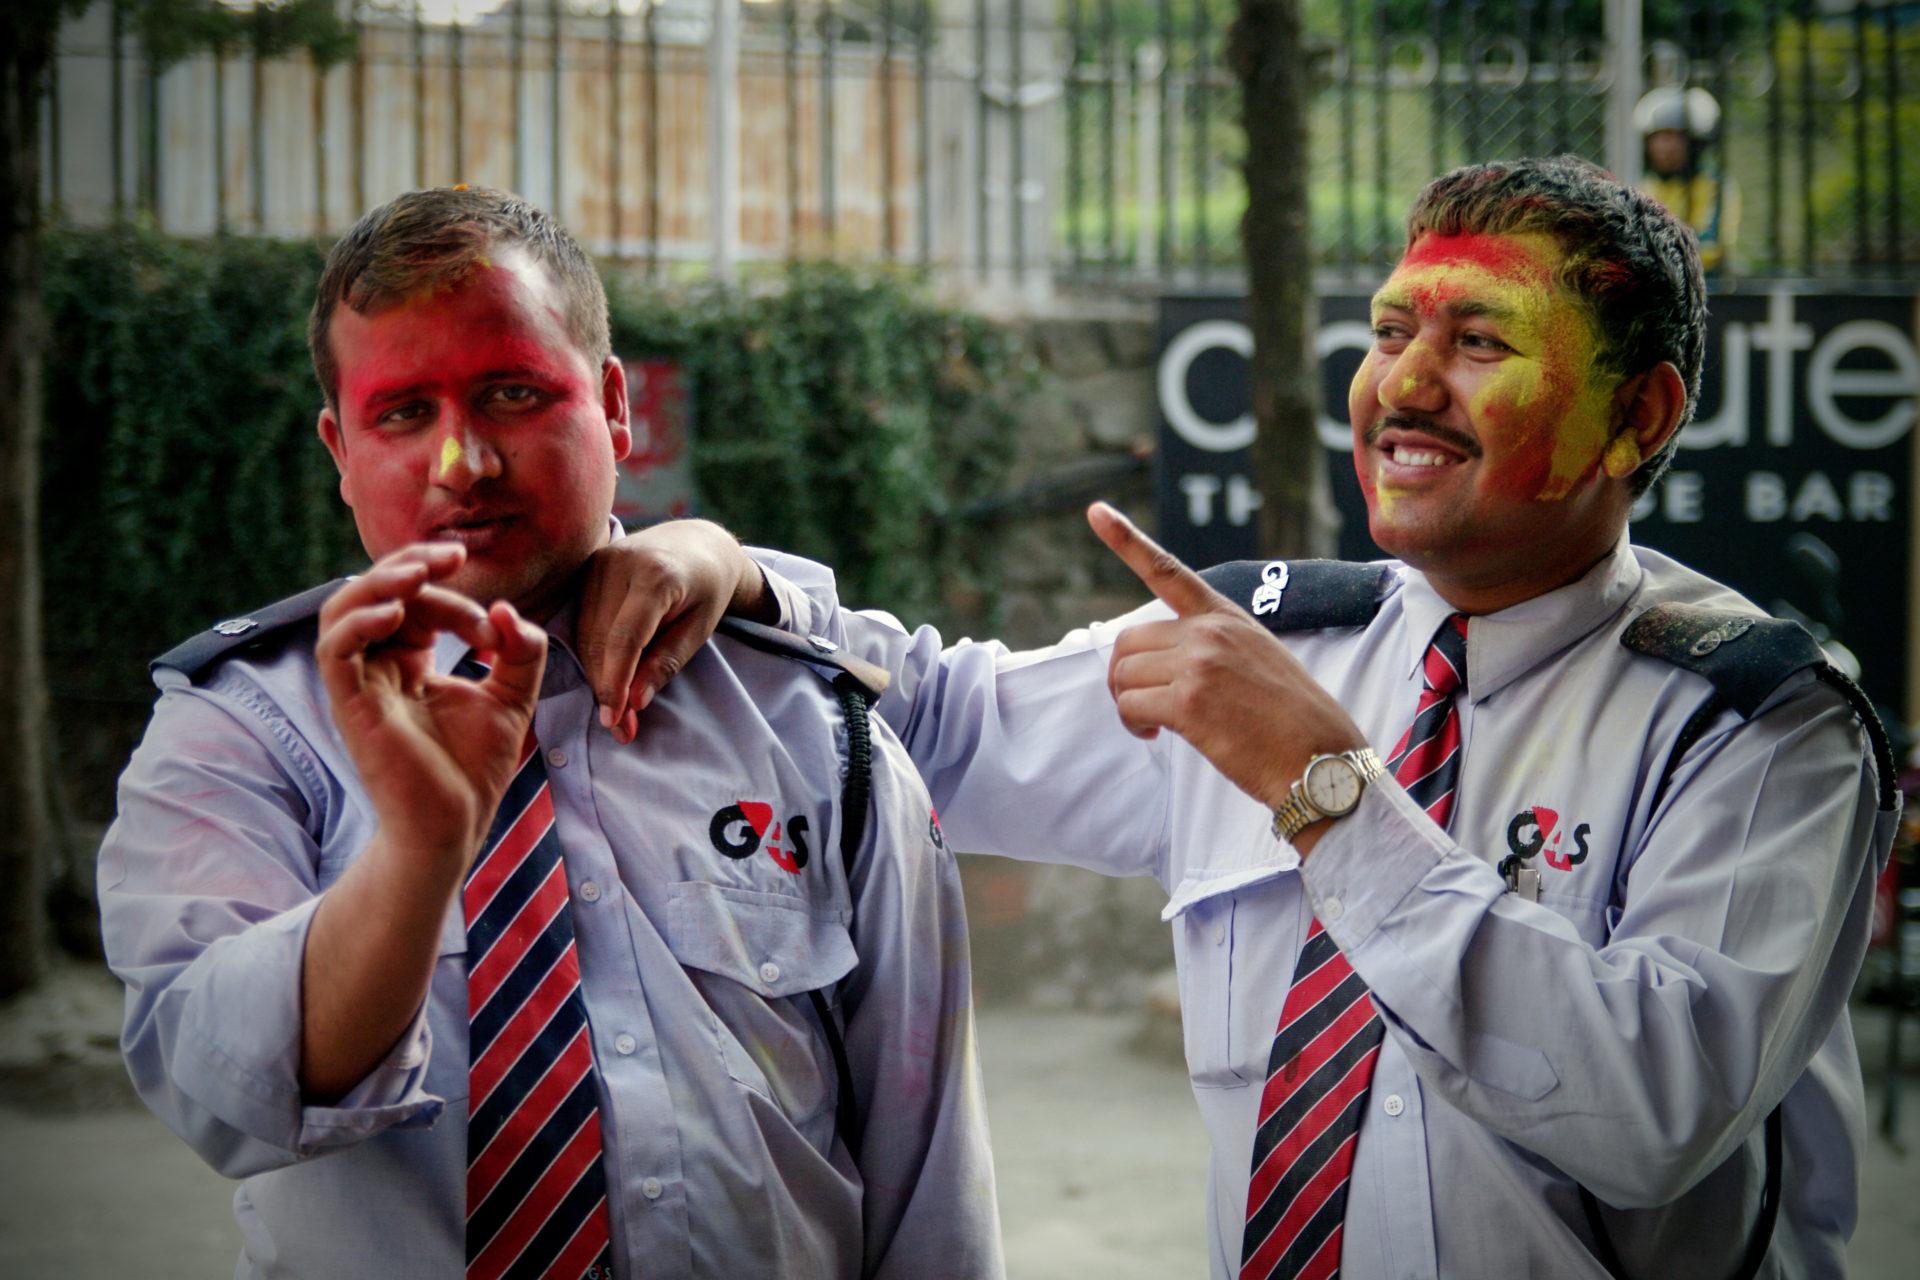 GIZ_Holi_Nepal_Security_IGP2584_Carolin-Weinkopf